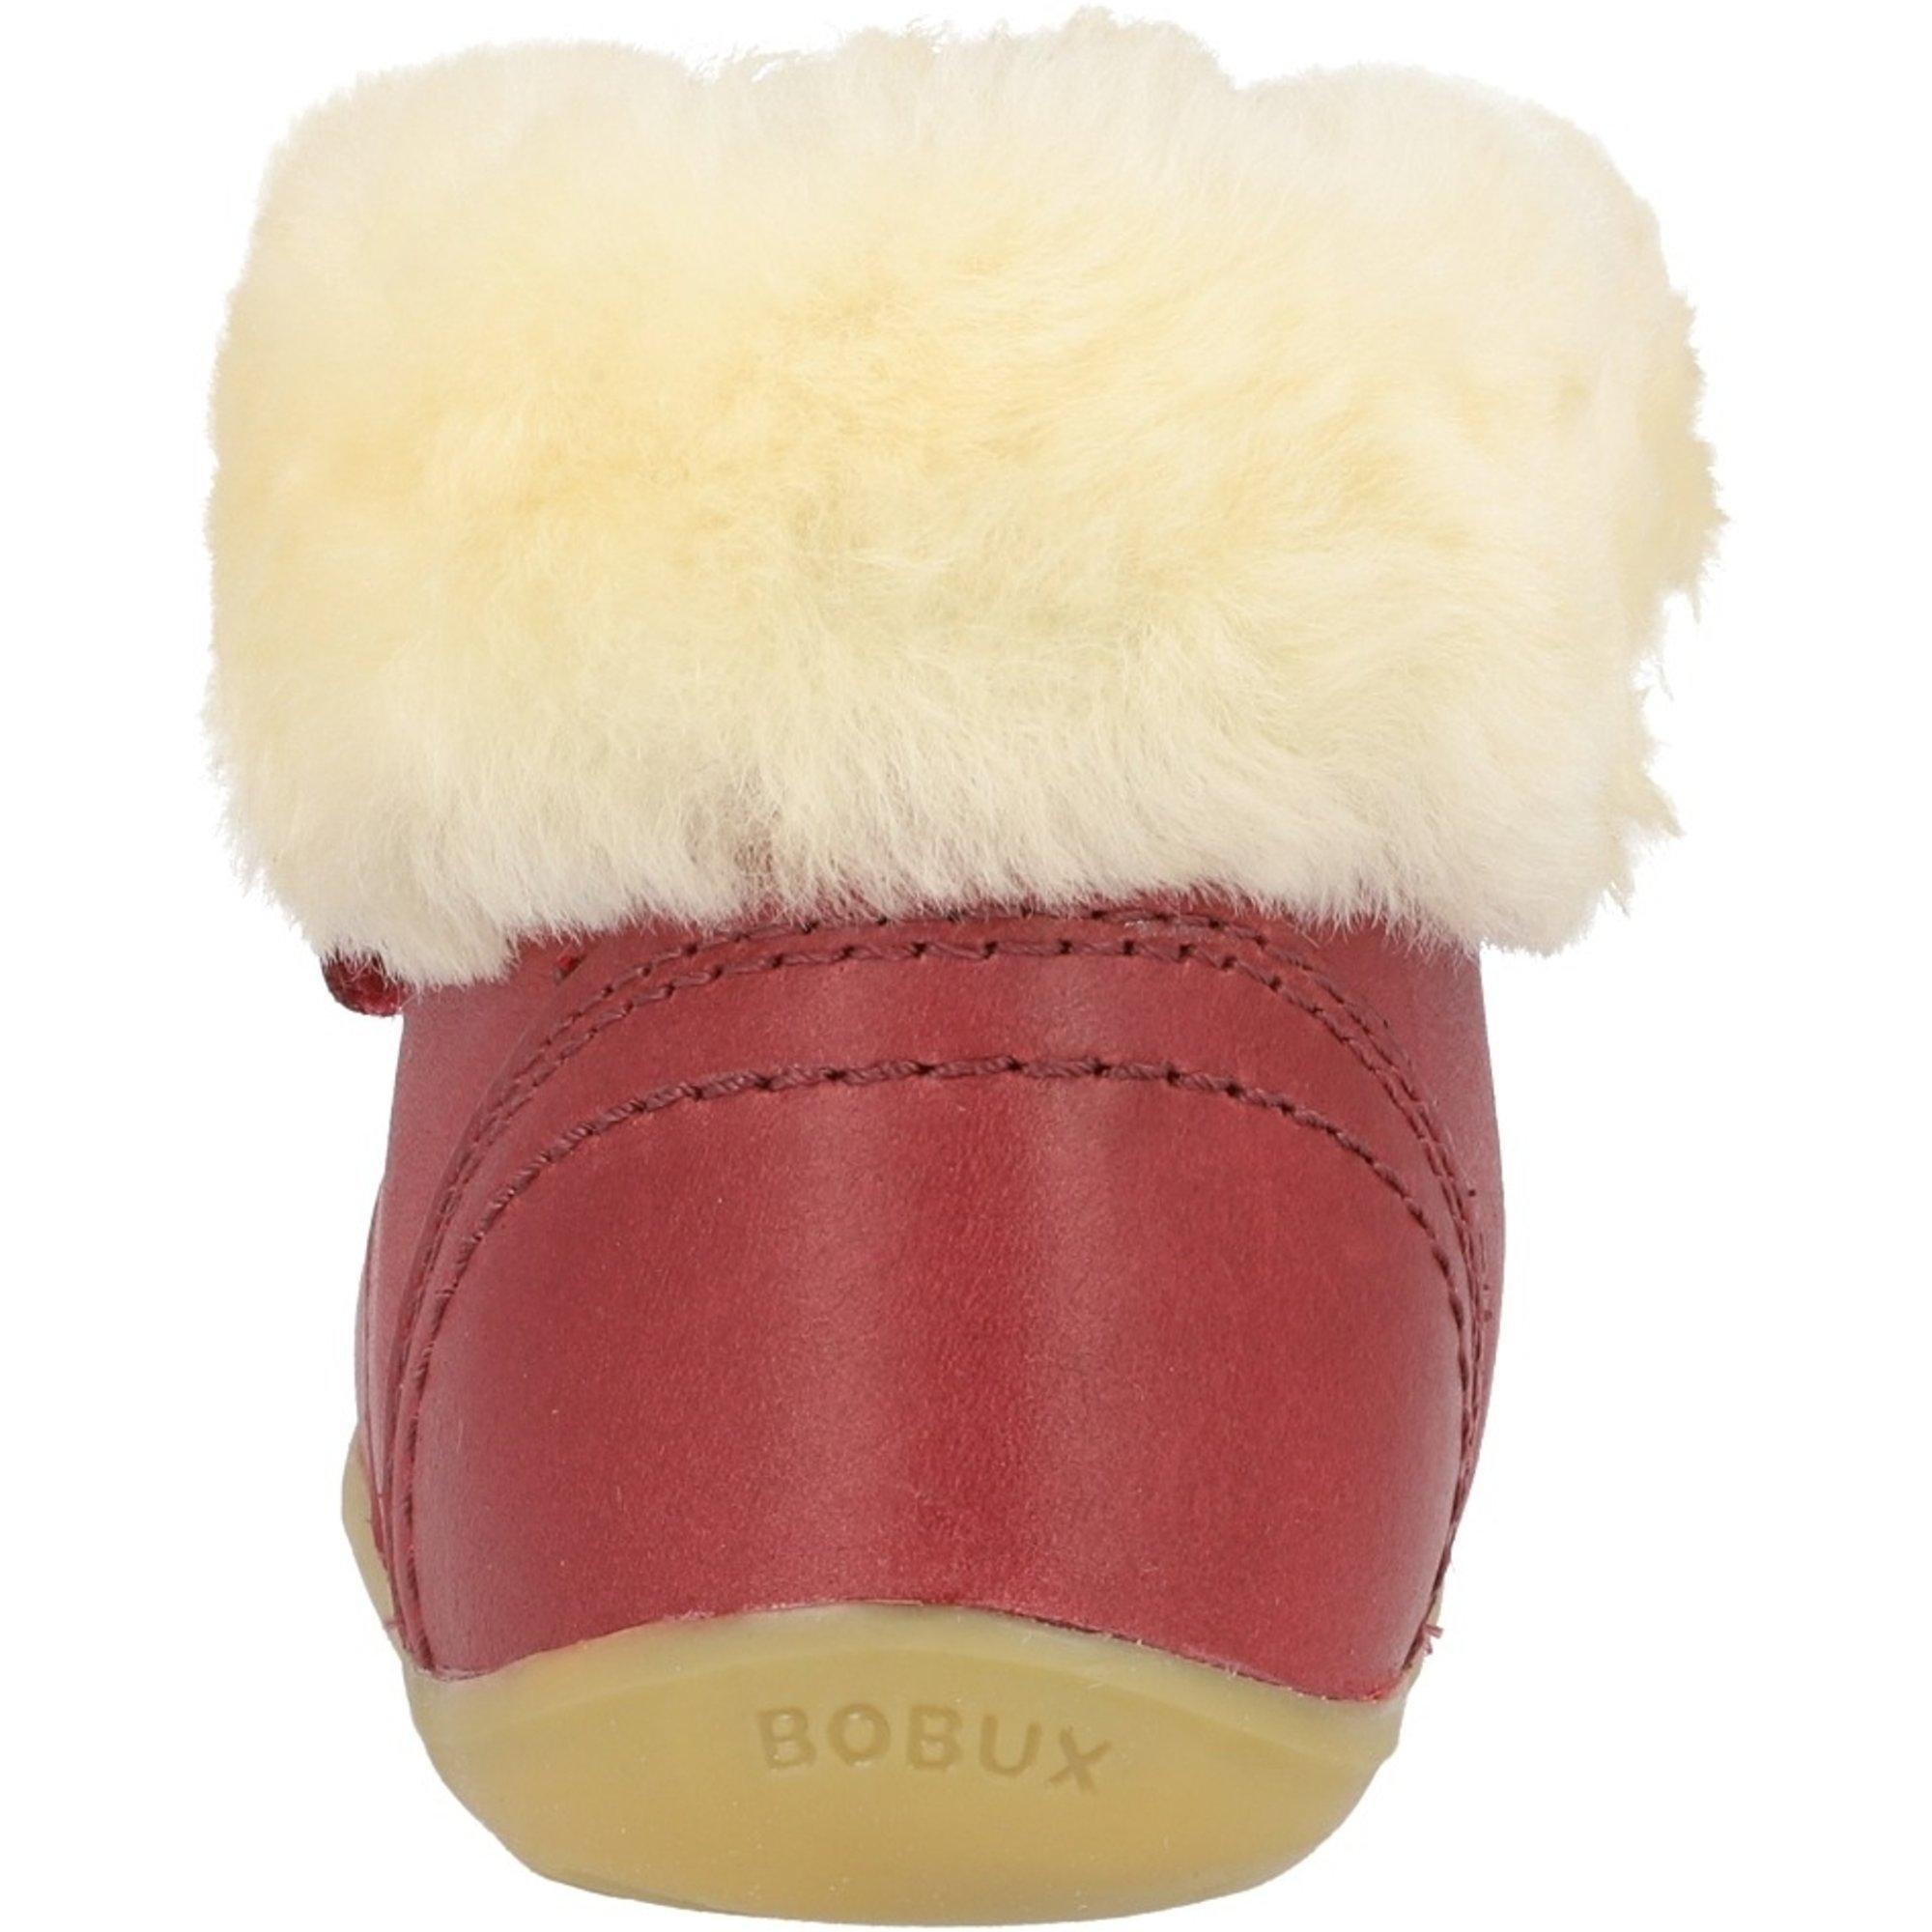 Bobux Step Up Desert Arctic Sherbet Quickdry Vintage-Look Leather